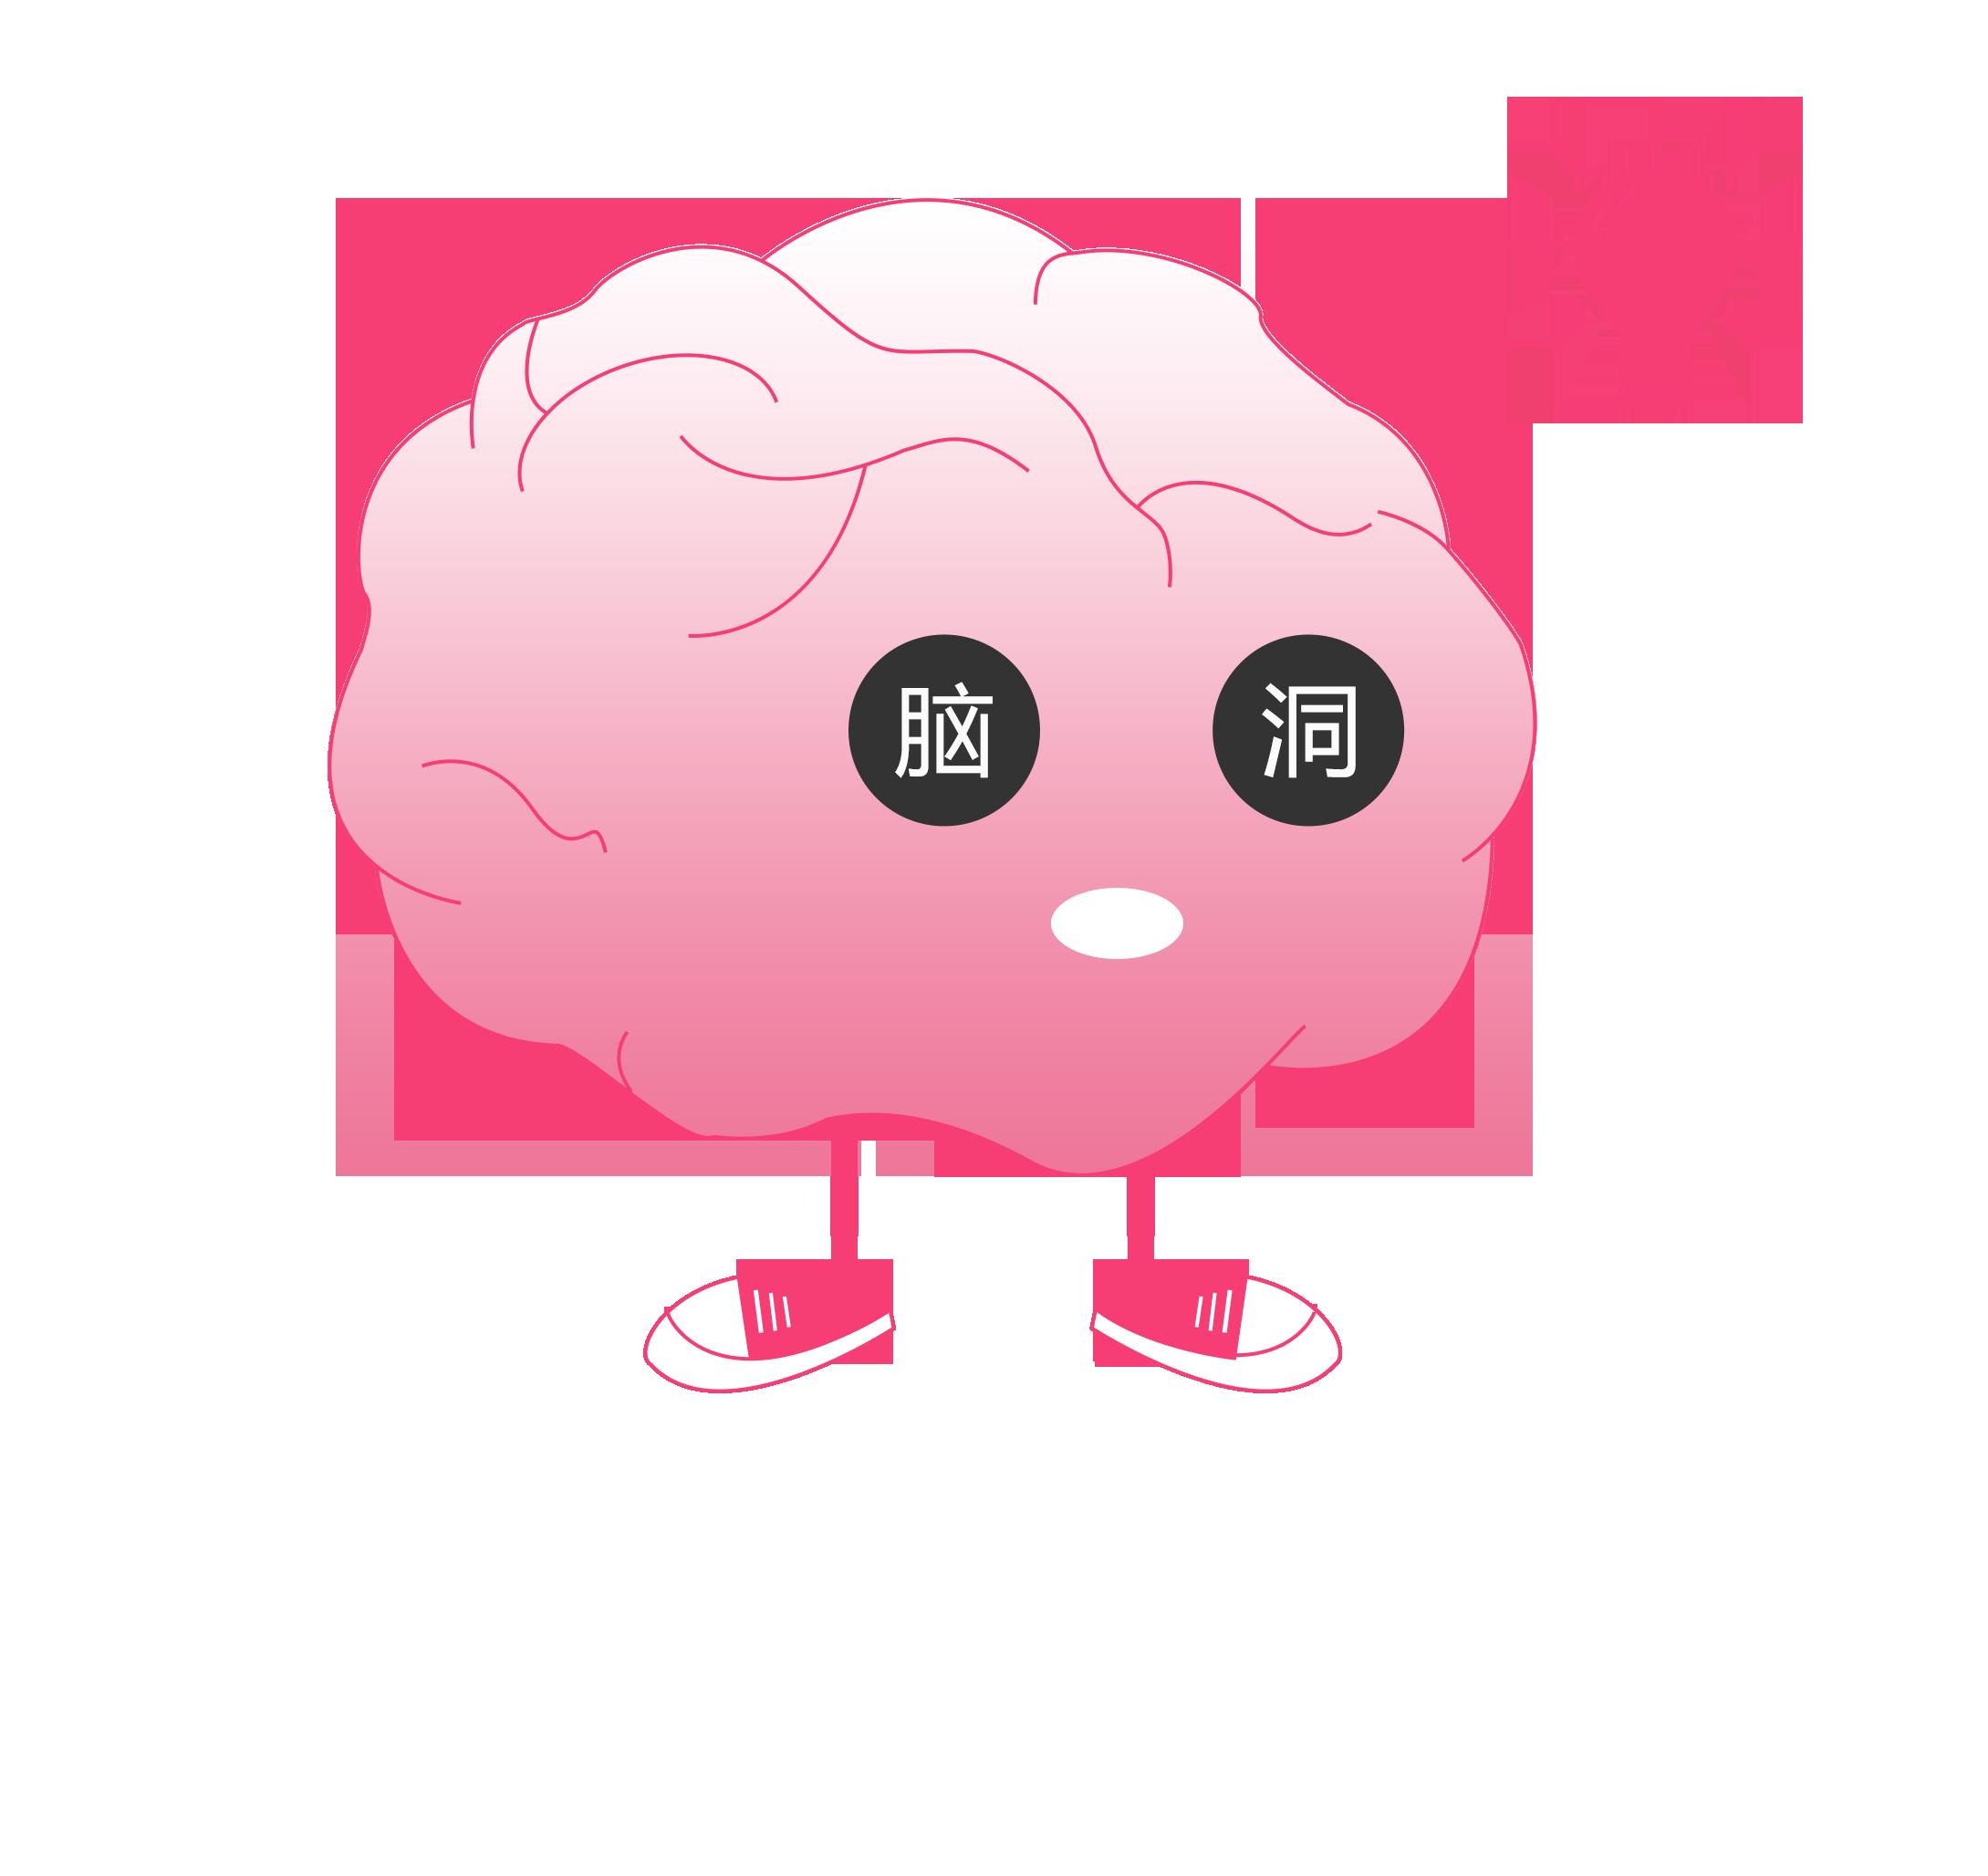 脑洞大师-Emoji样式贼多 messages sticker-9